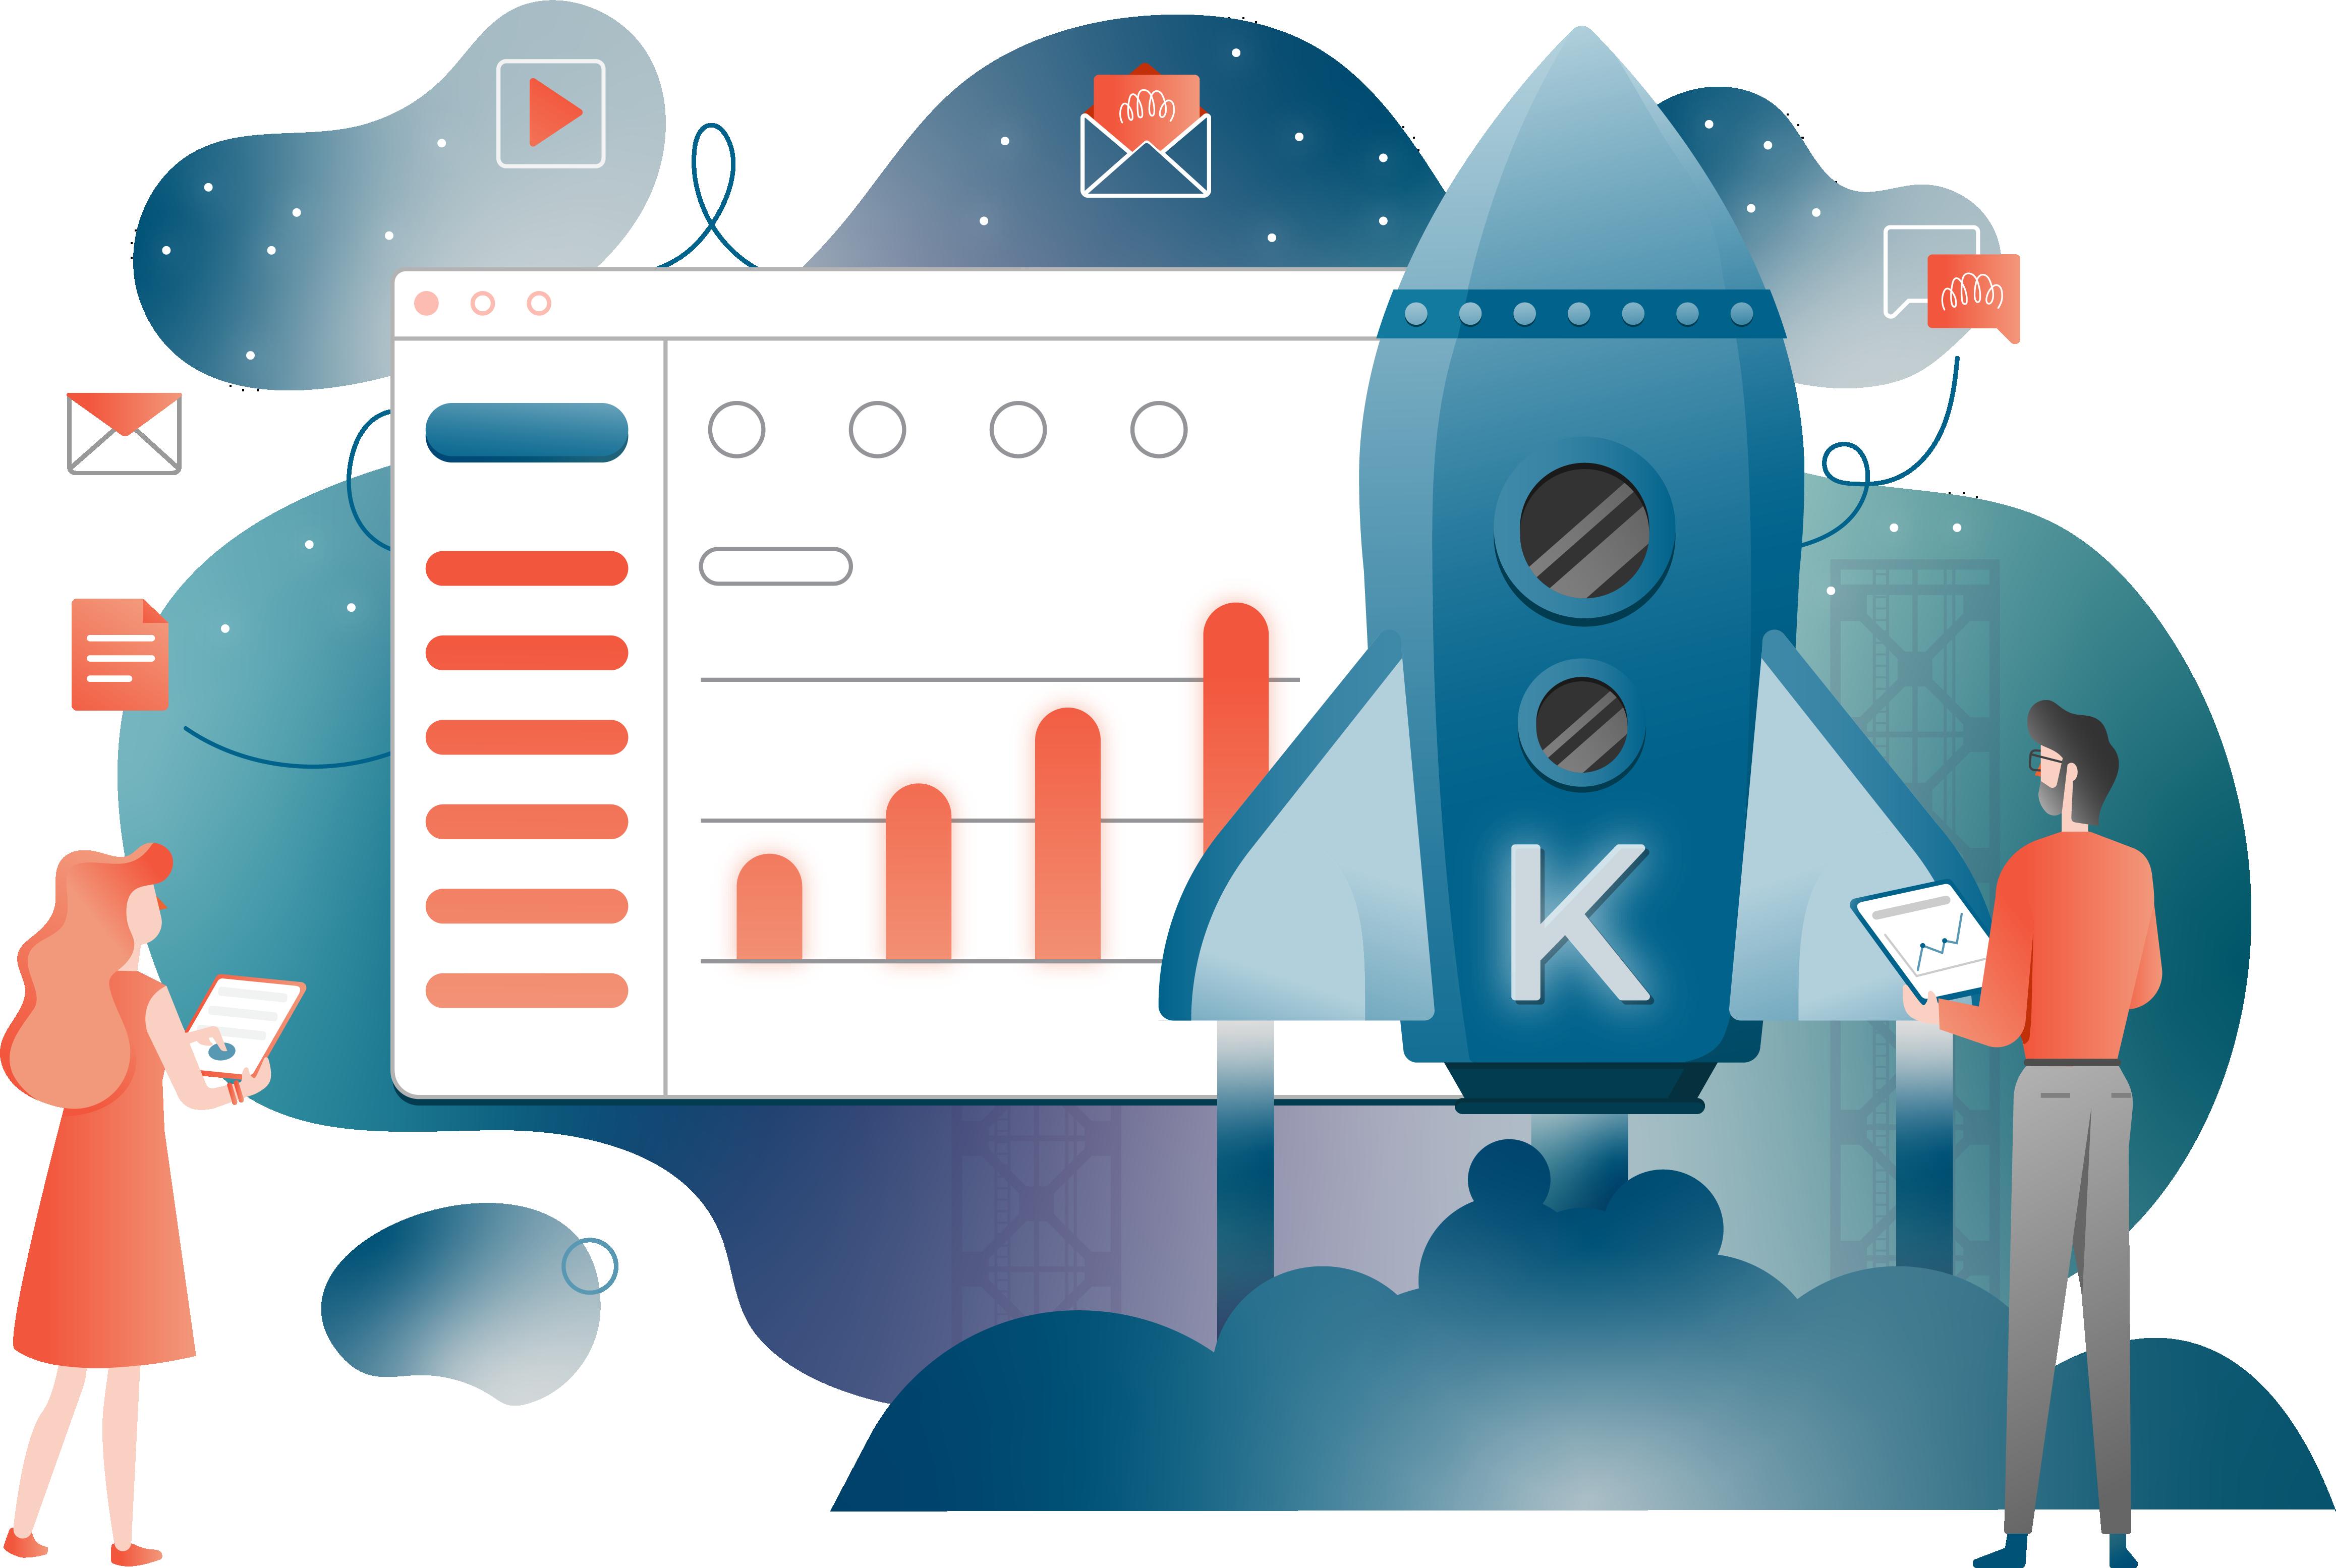 Autoklose.com B2B Sales Email Engagement Platform